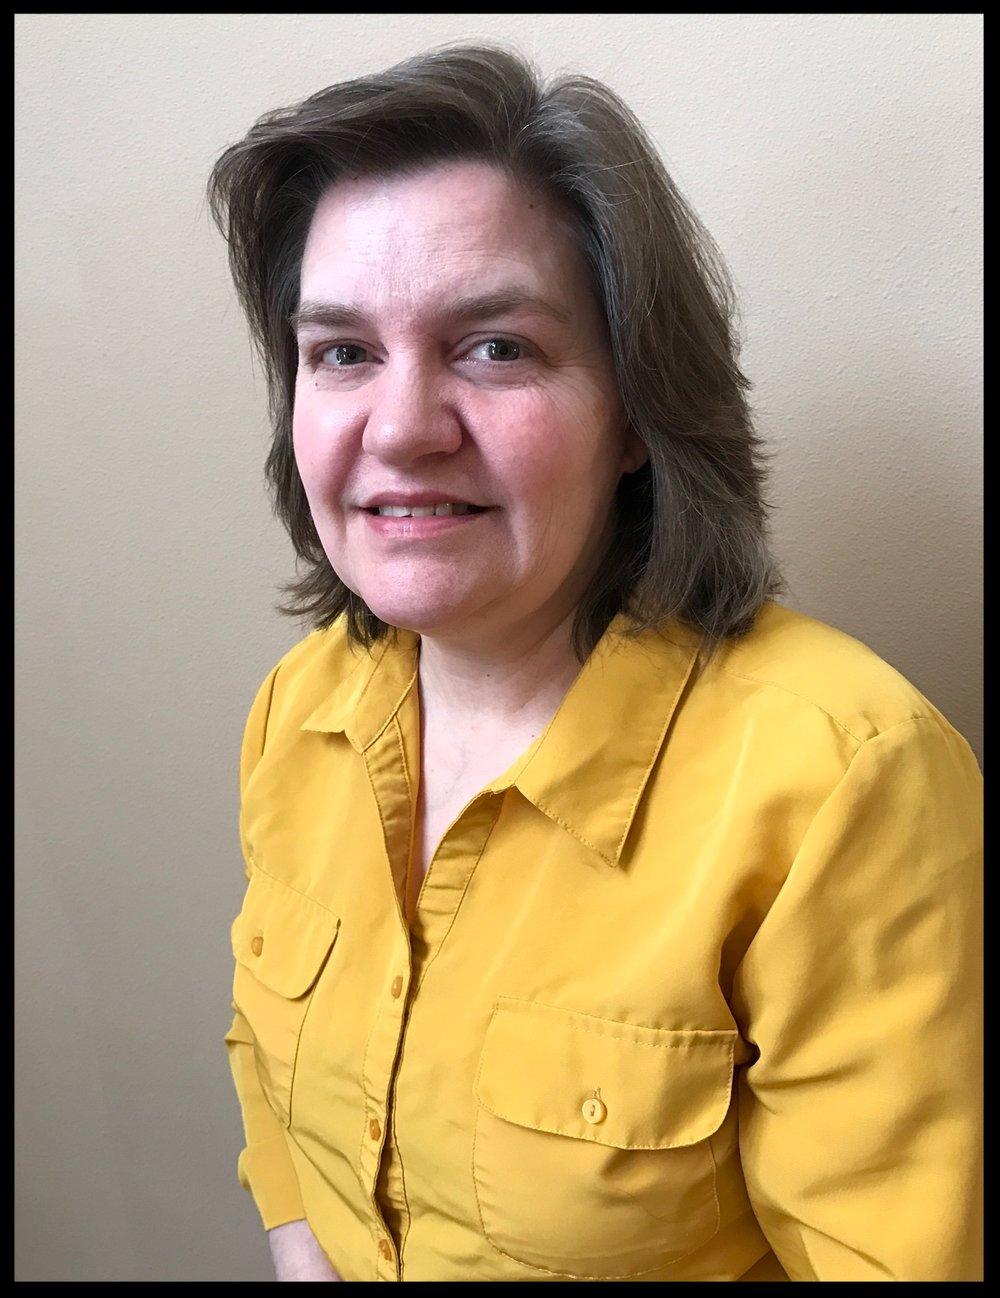 Christine L. Garner